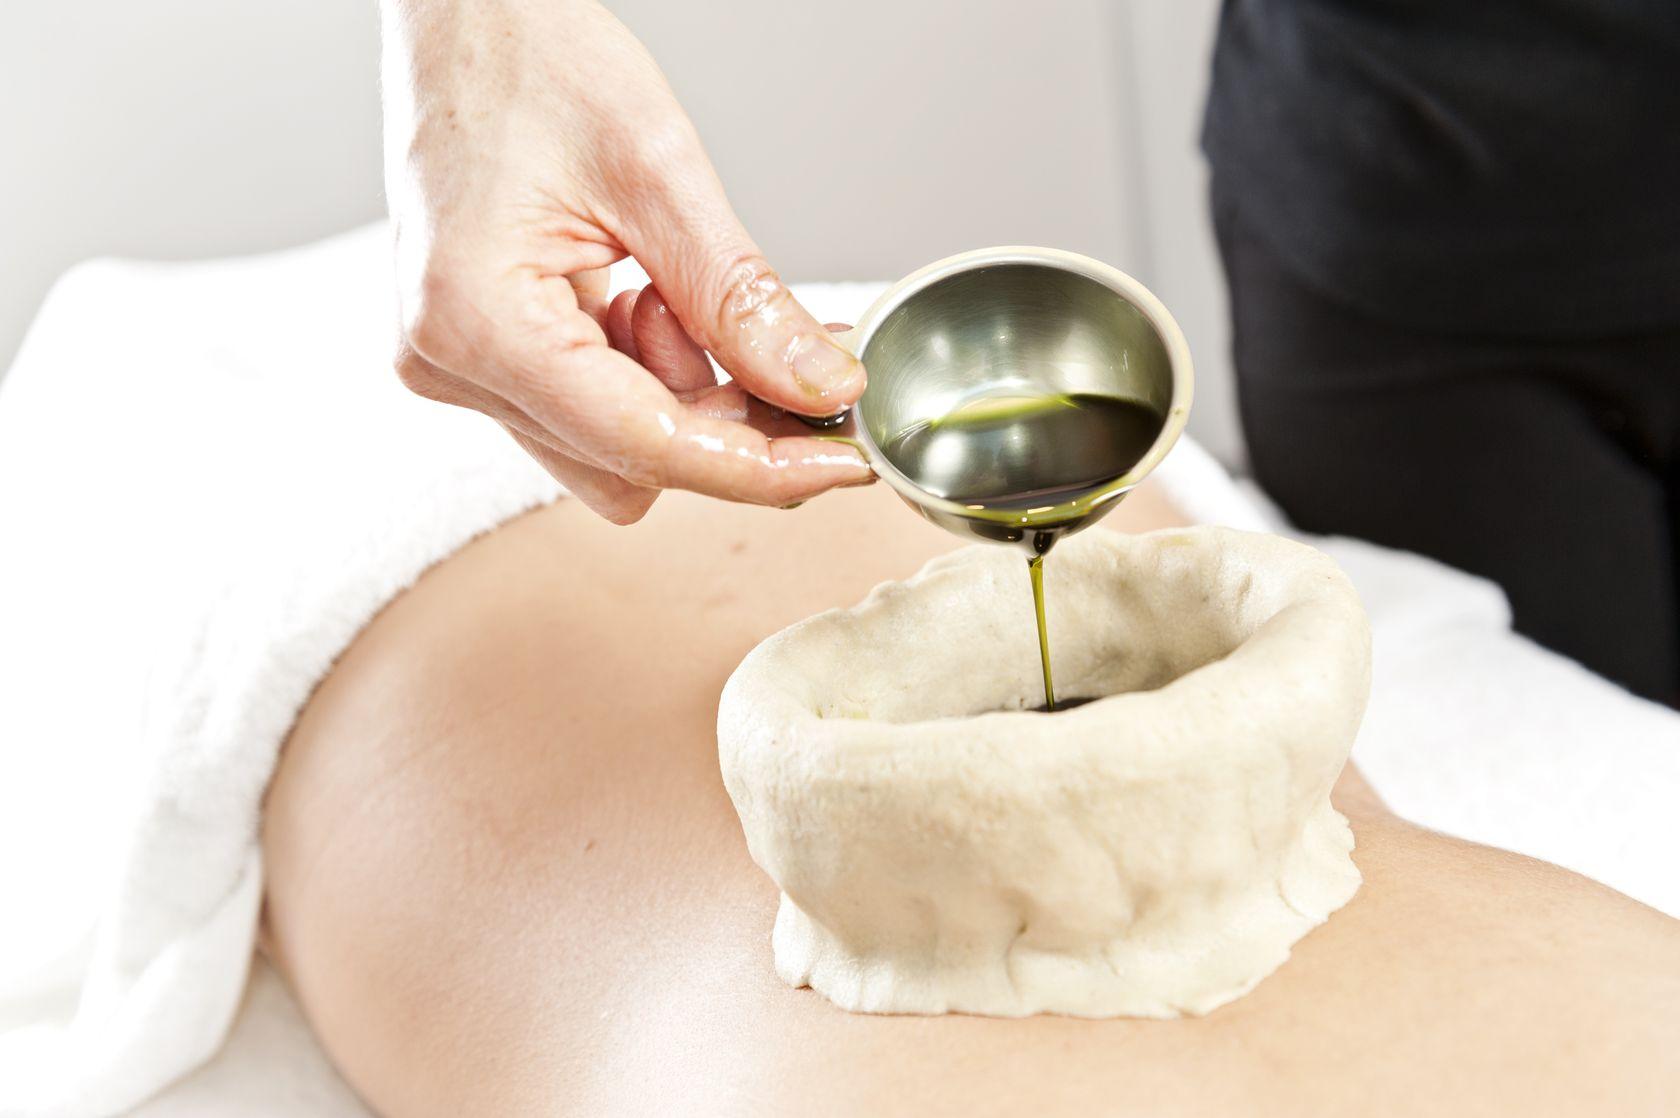 vata massage ayurveda